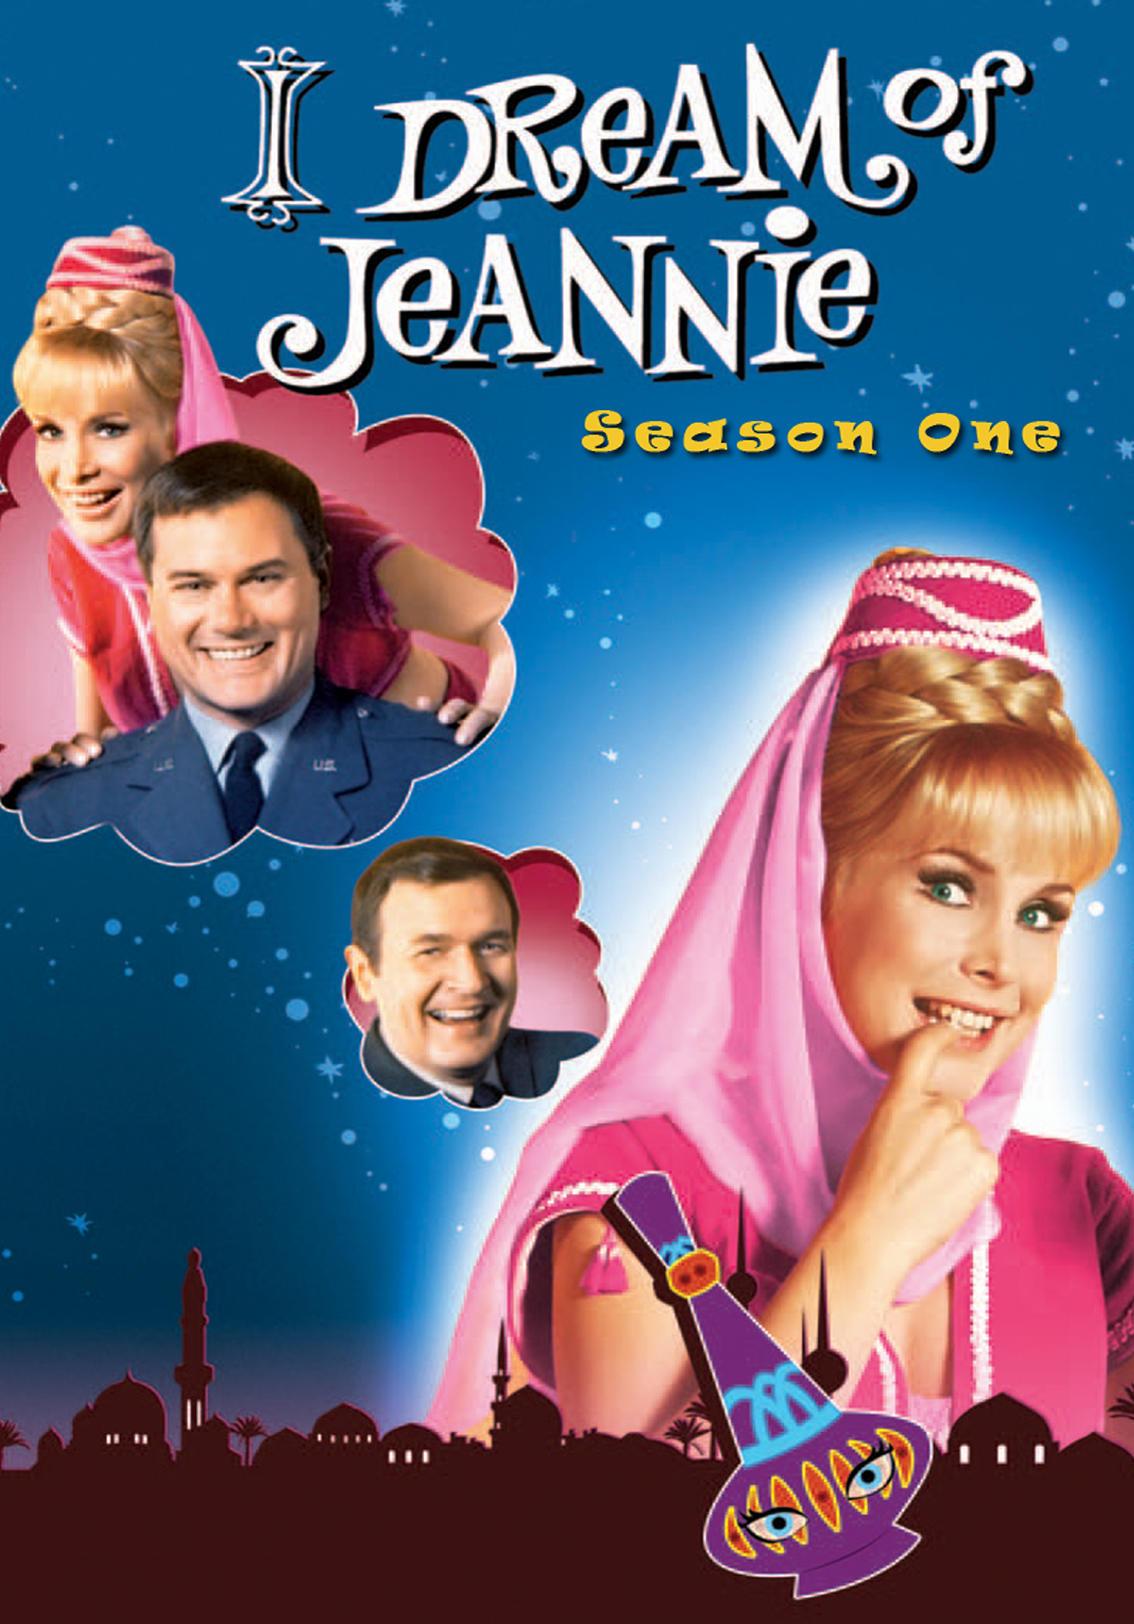 I Dream of Jeannie - VUDU Season Sets $9.99 ea